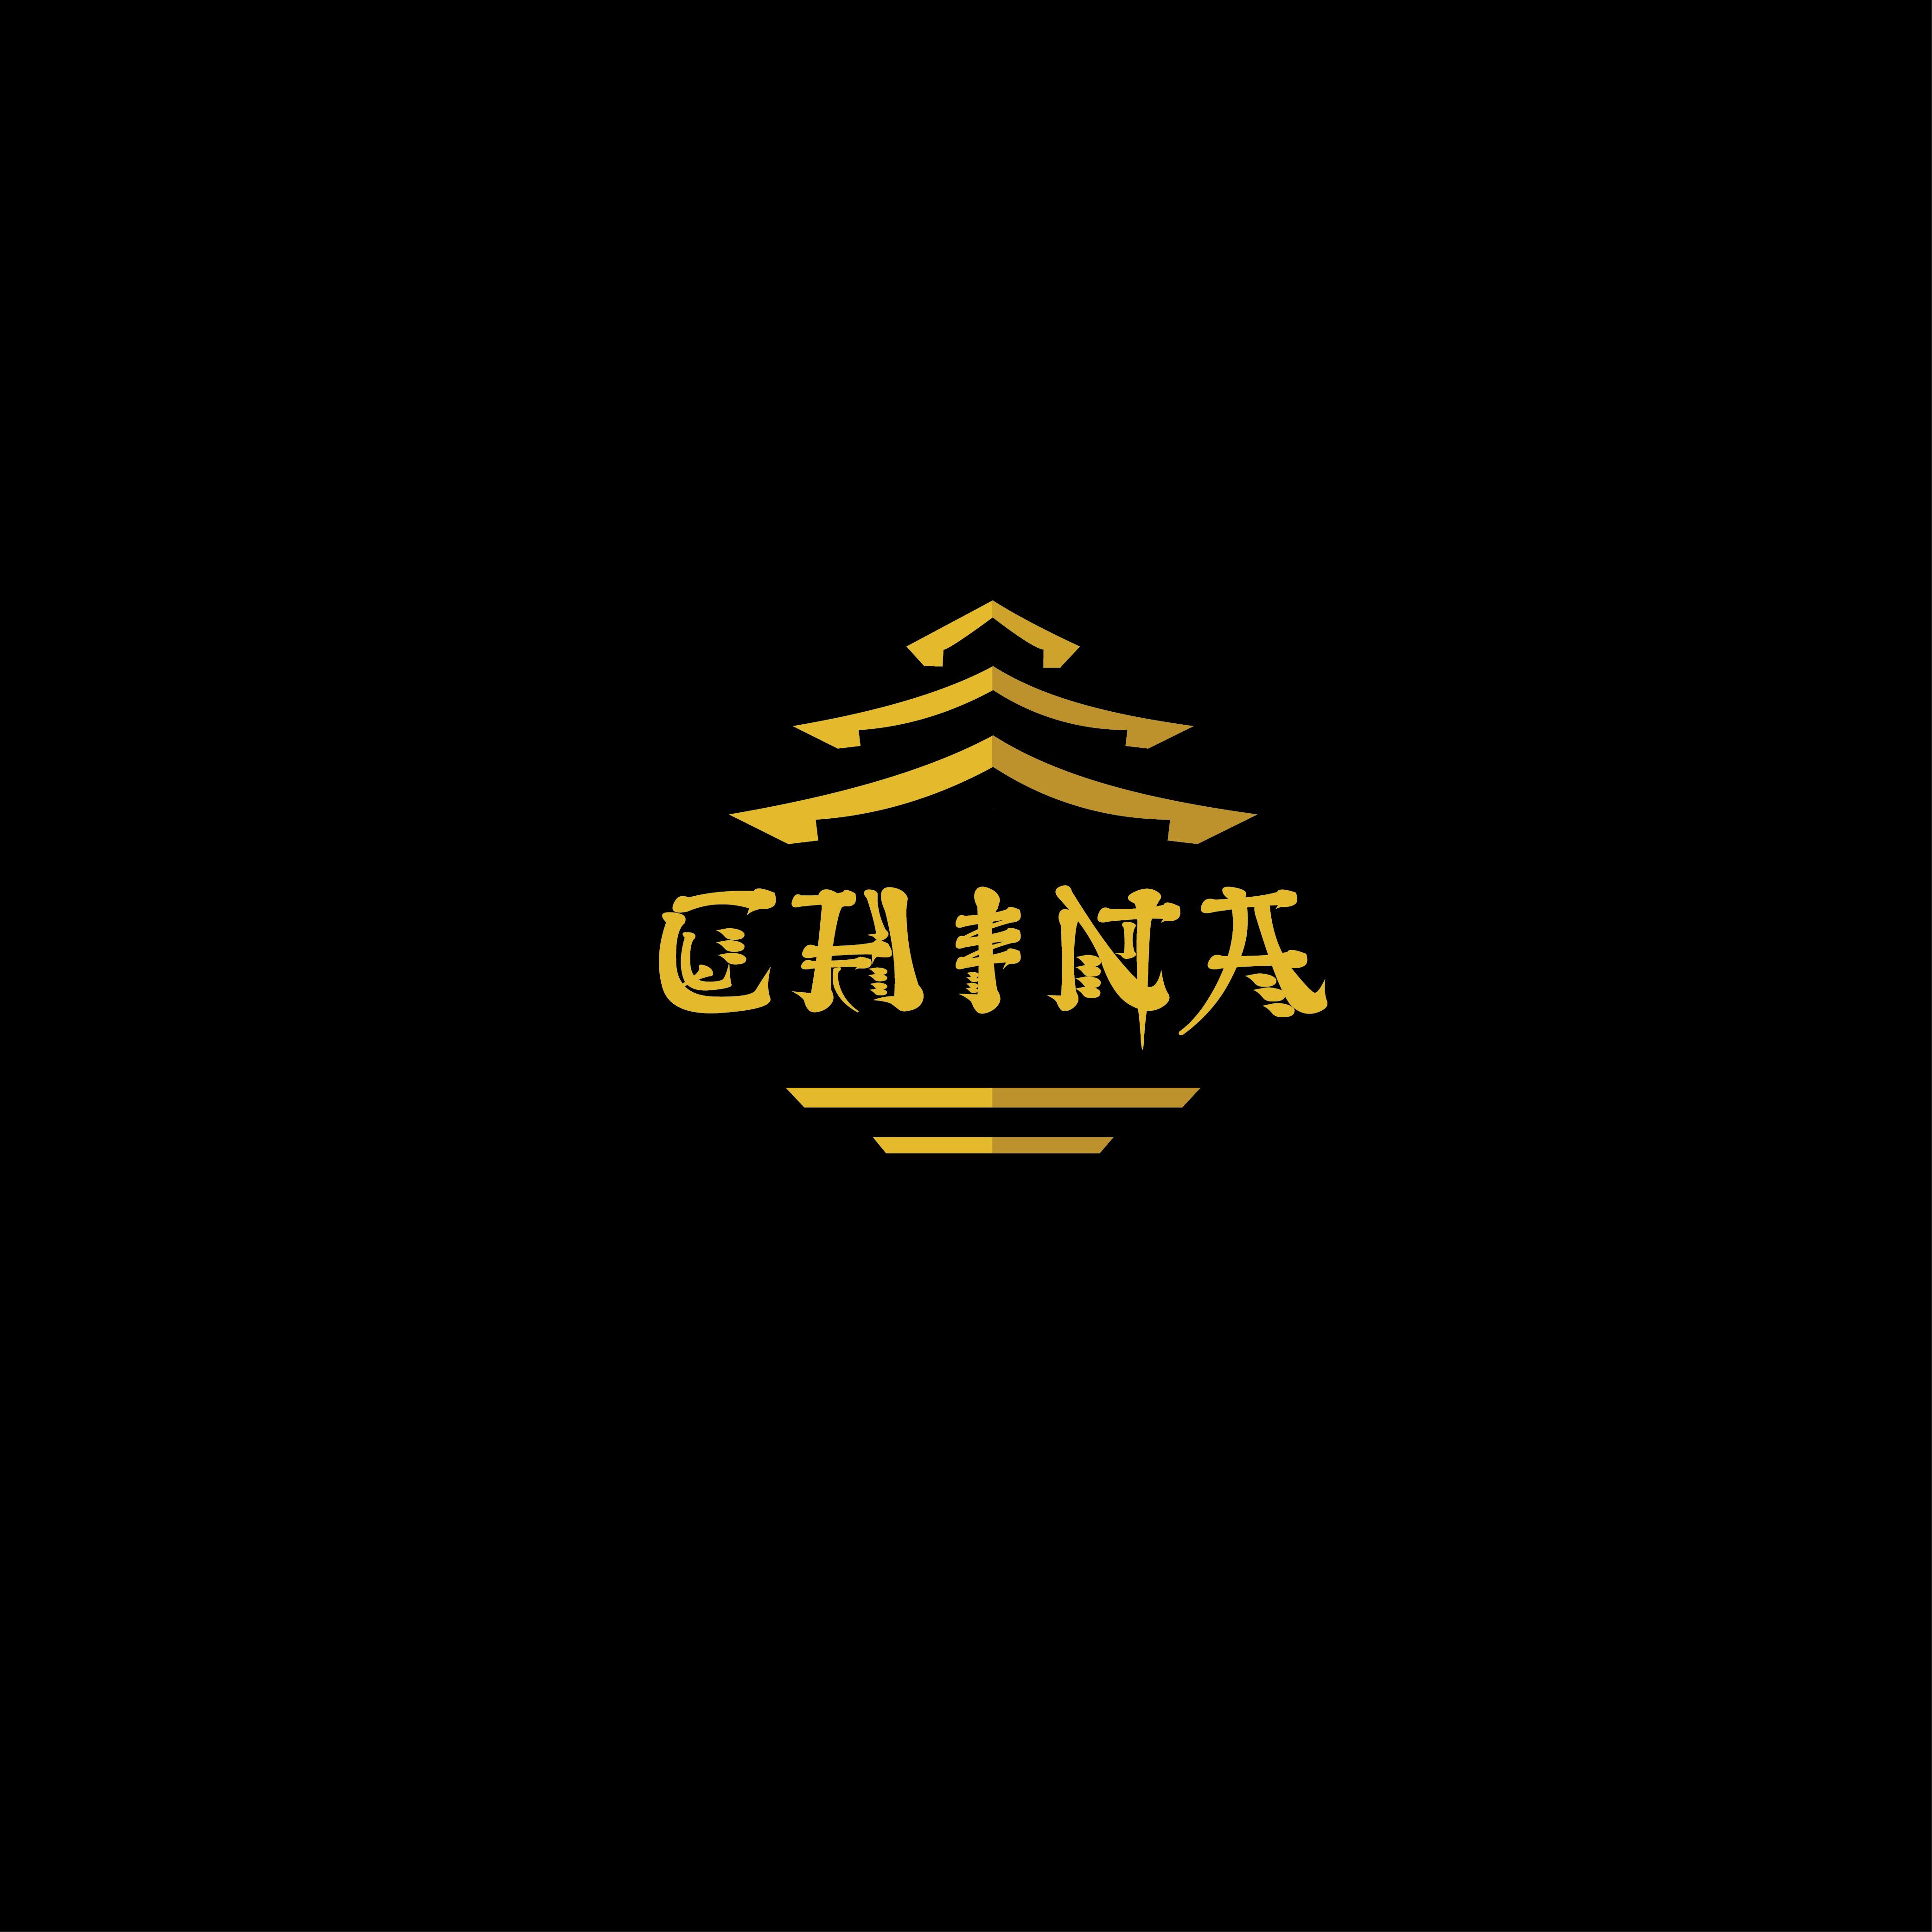 china resto logo 100606 personal design branding design logo restaurant logo design chinese logo